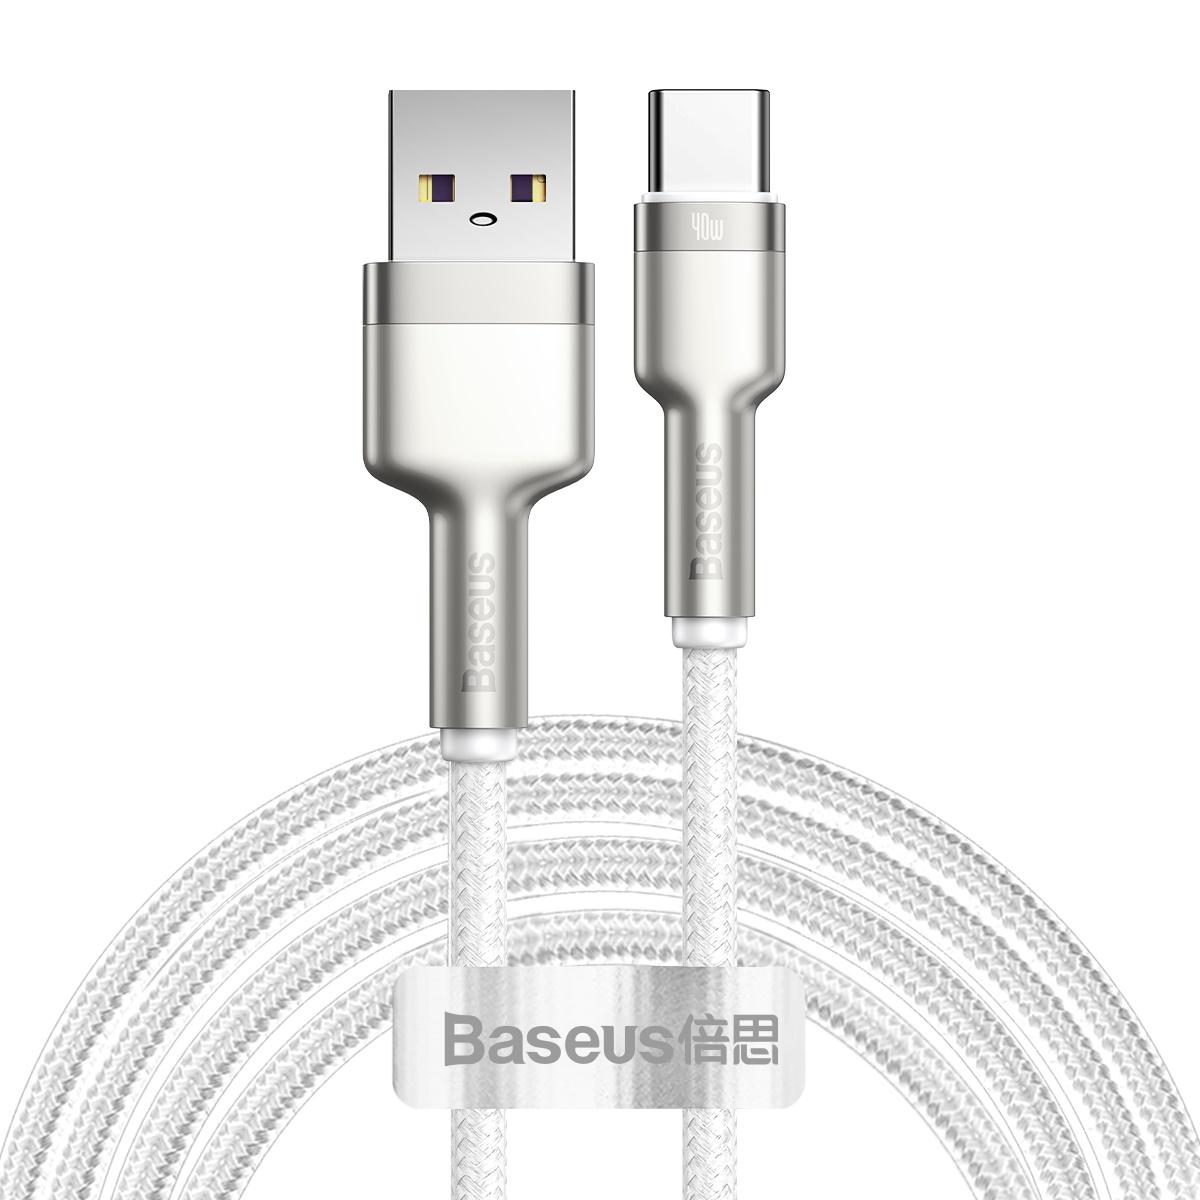 Baseus Cafule USB till USB-C datakabel, 40W, 5A, 2m, vit